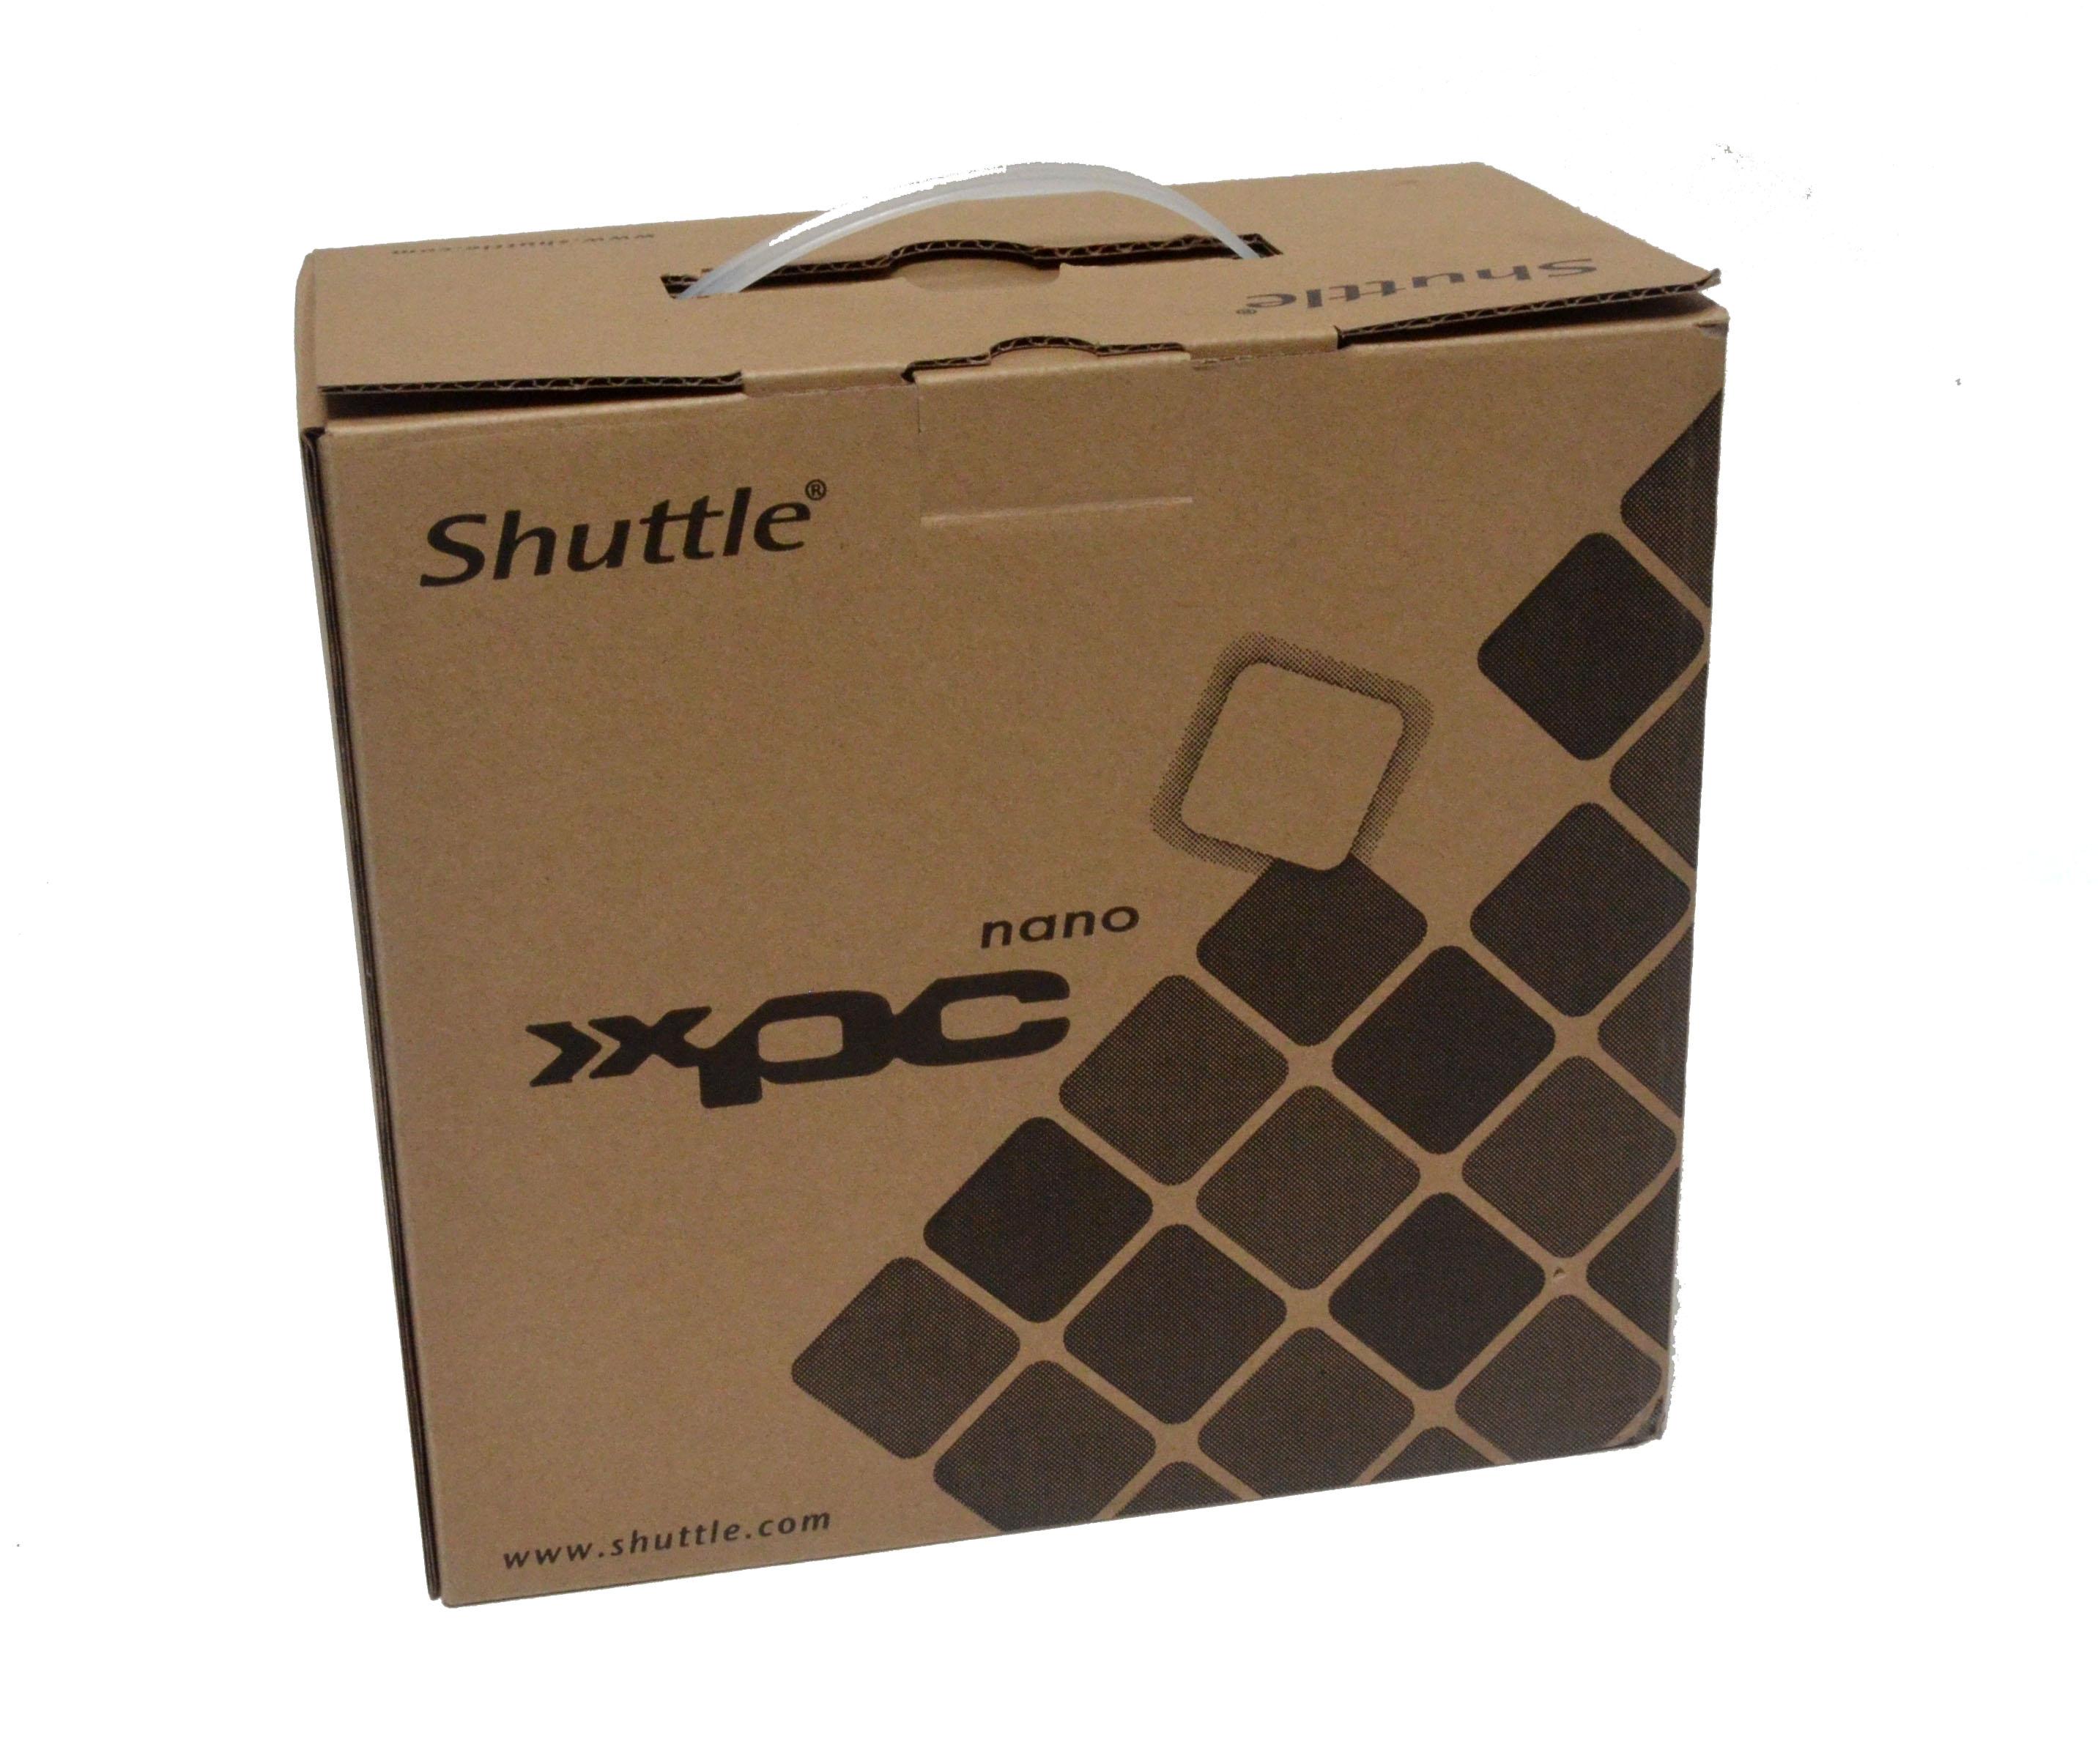 Shuttle XPC nano NC03U3 opakowanie